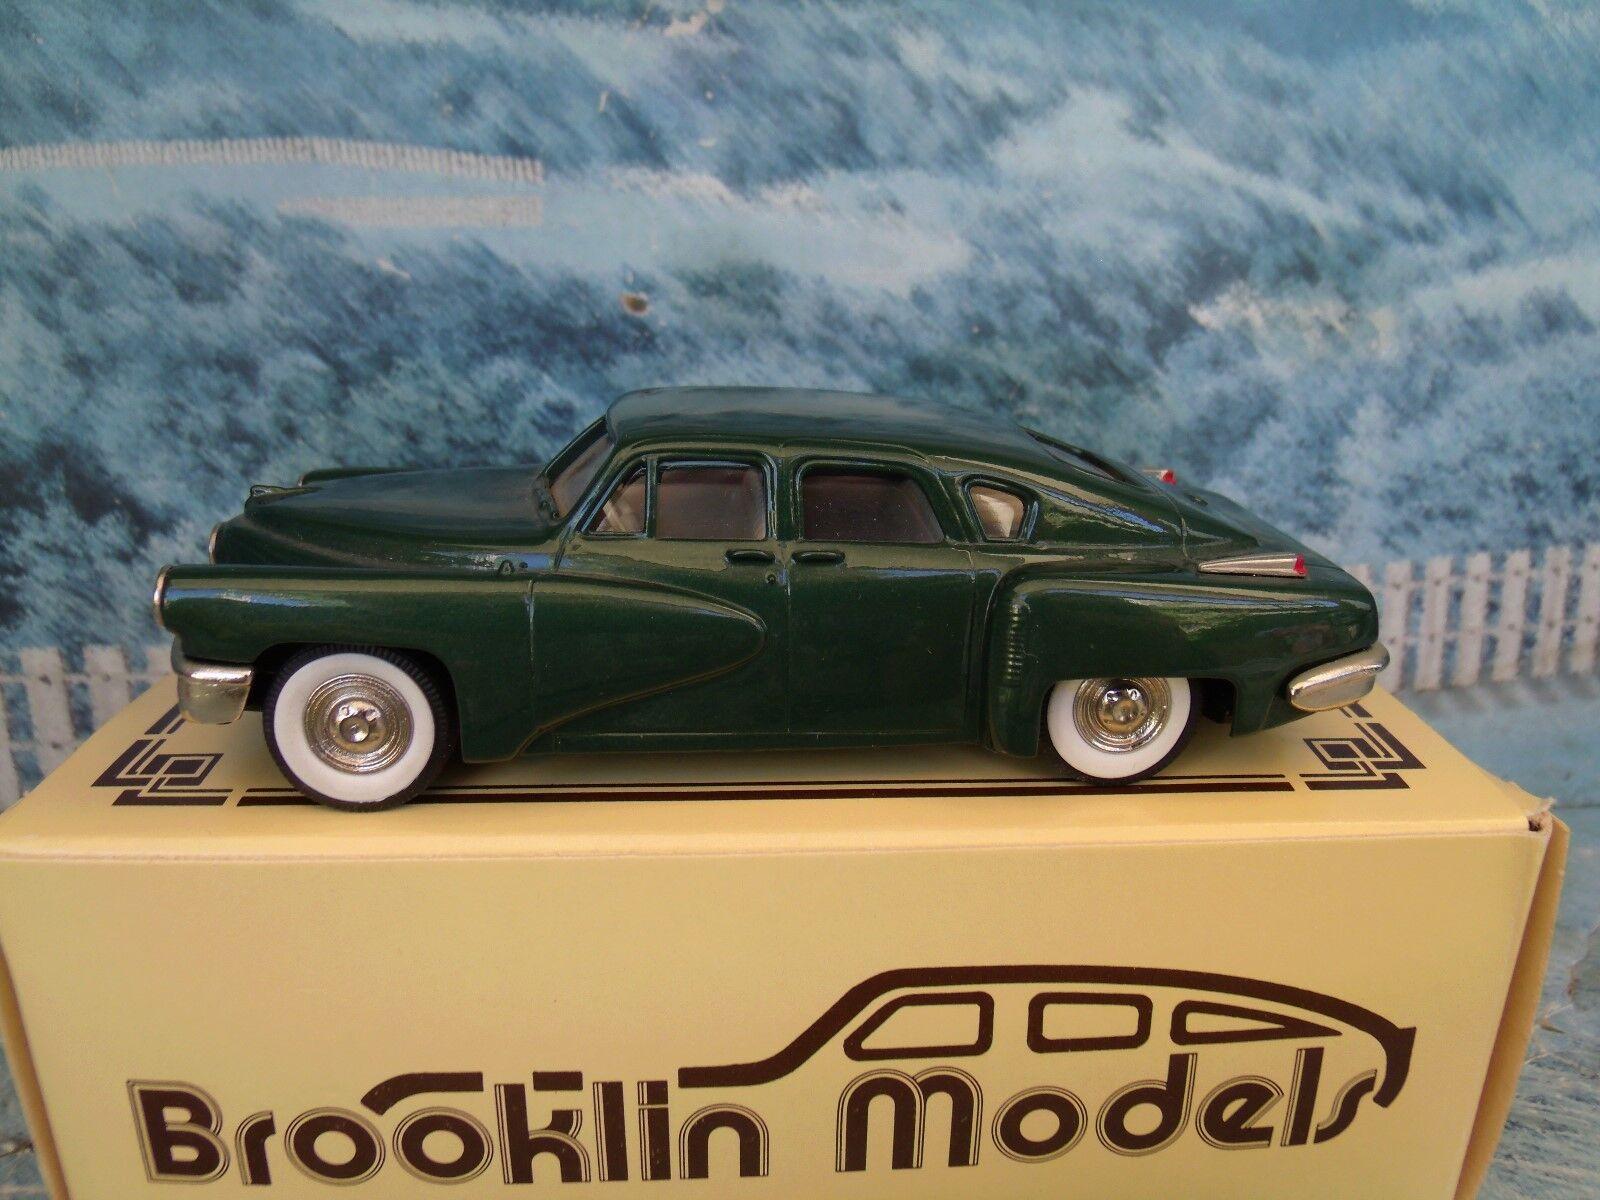 1 43 Brooklin modelos (Inglaterra) 1948 Tucker Torpedo De Metal biancao BRK.2x